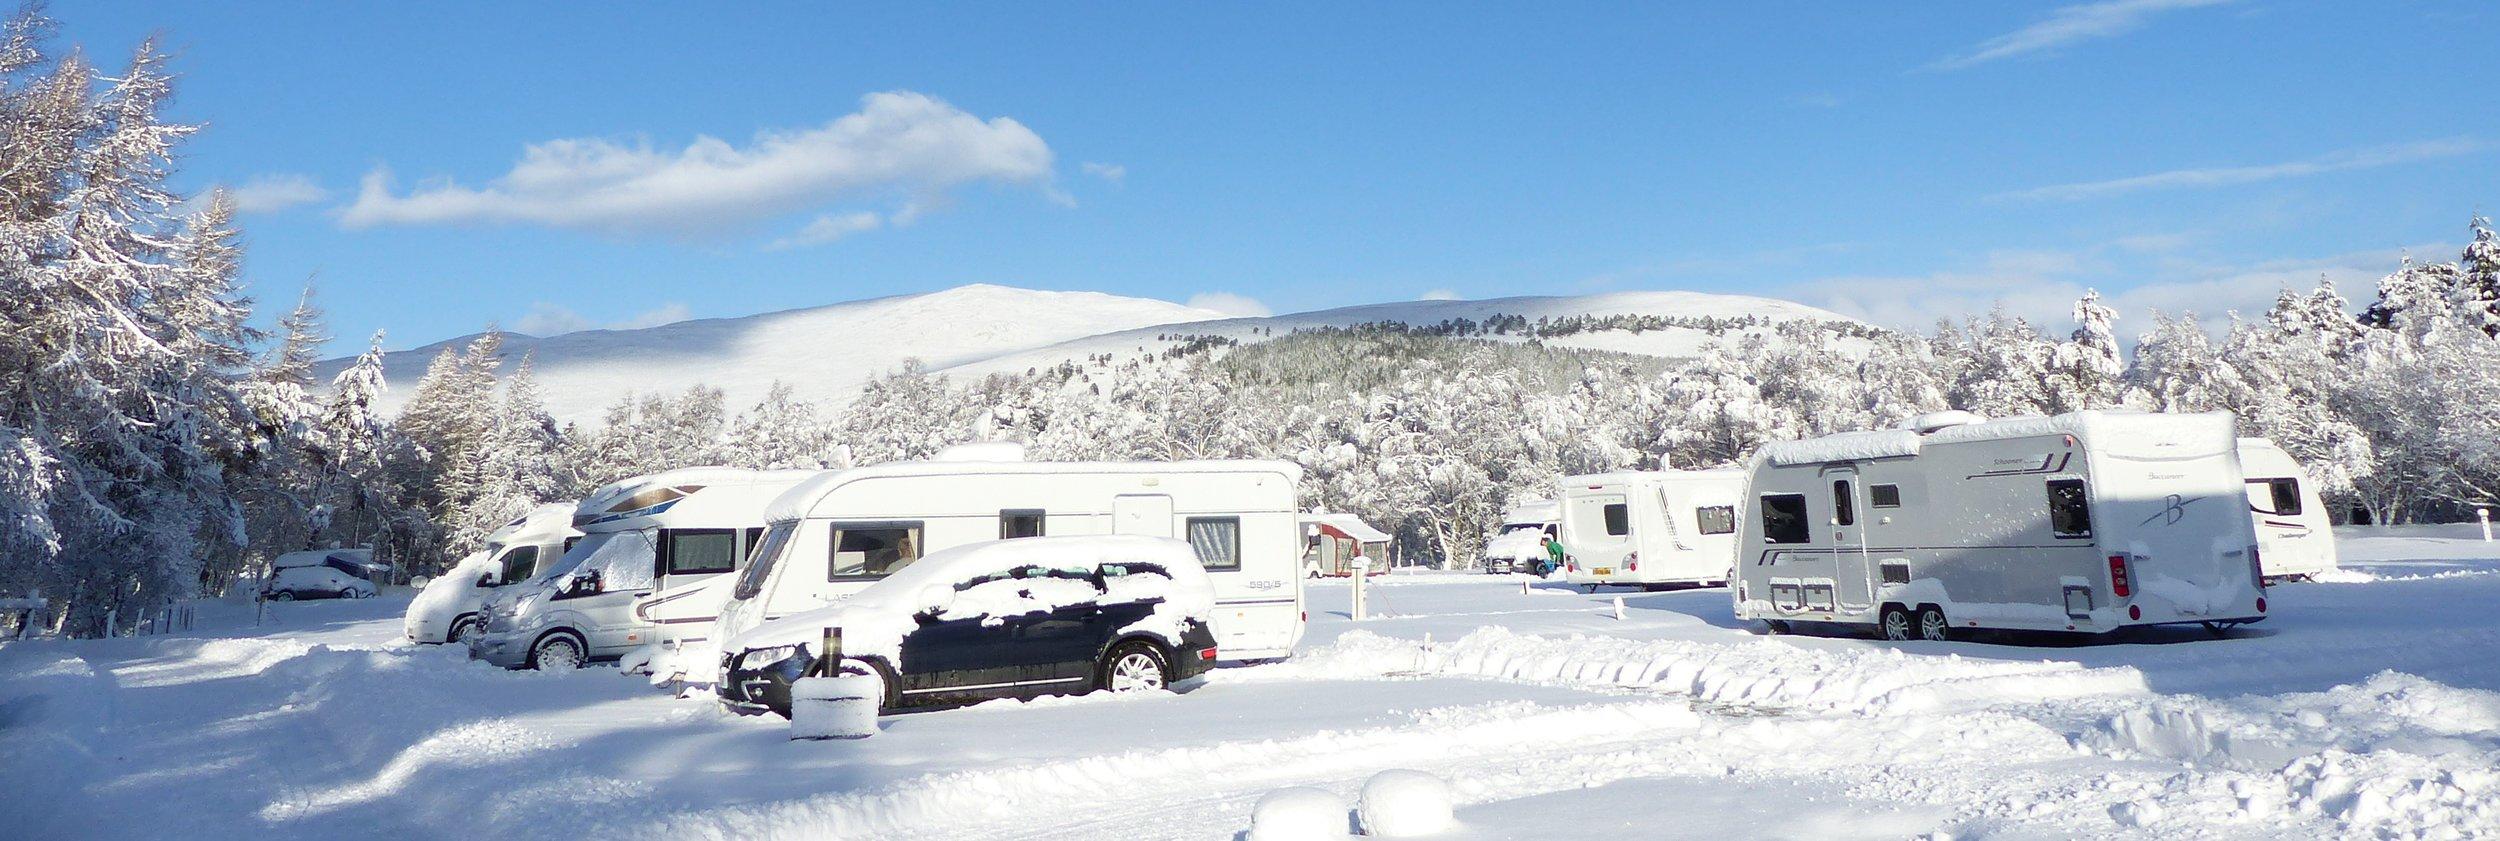 Winter in Braemar